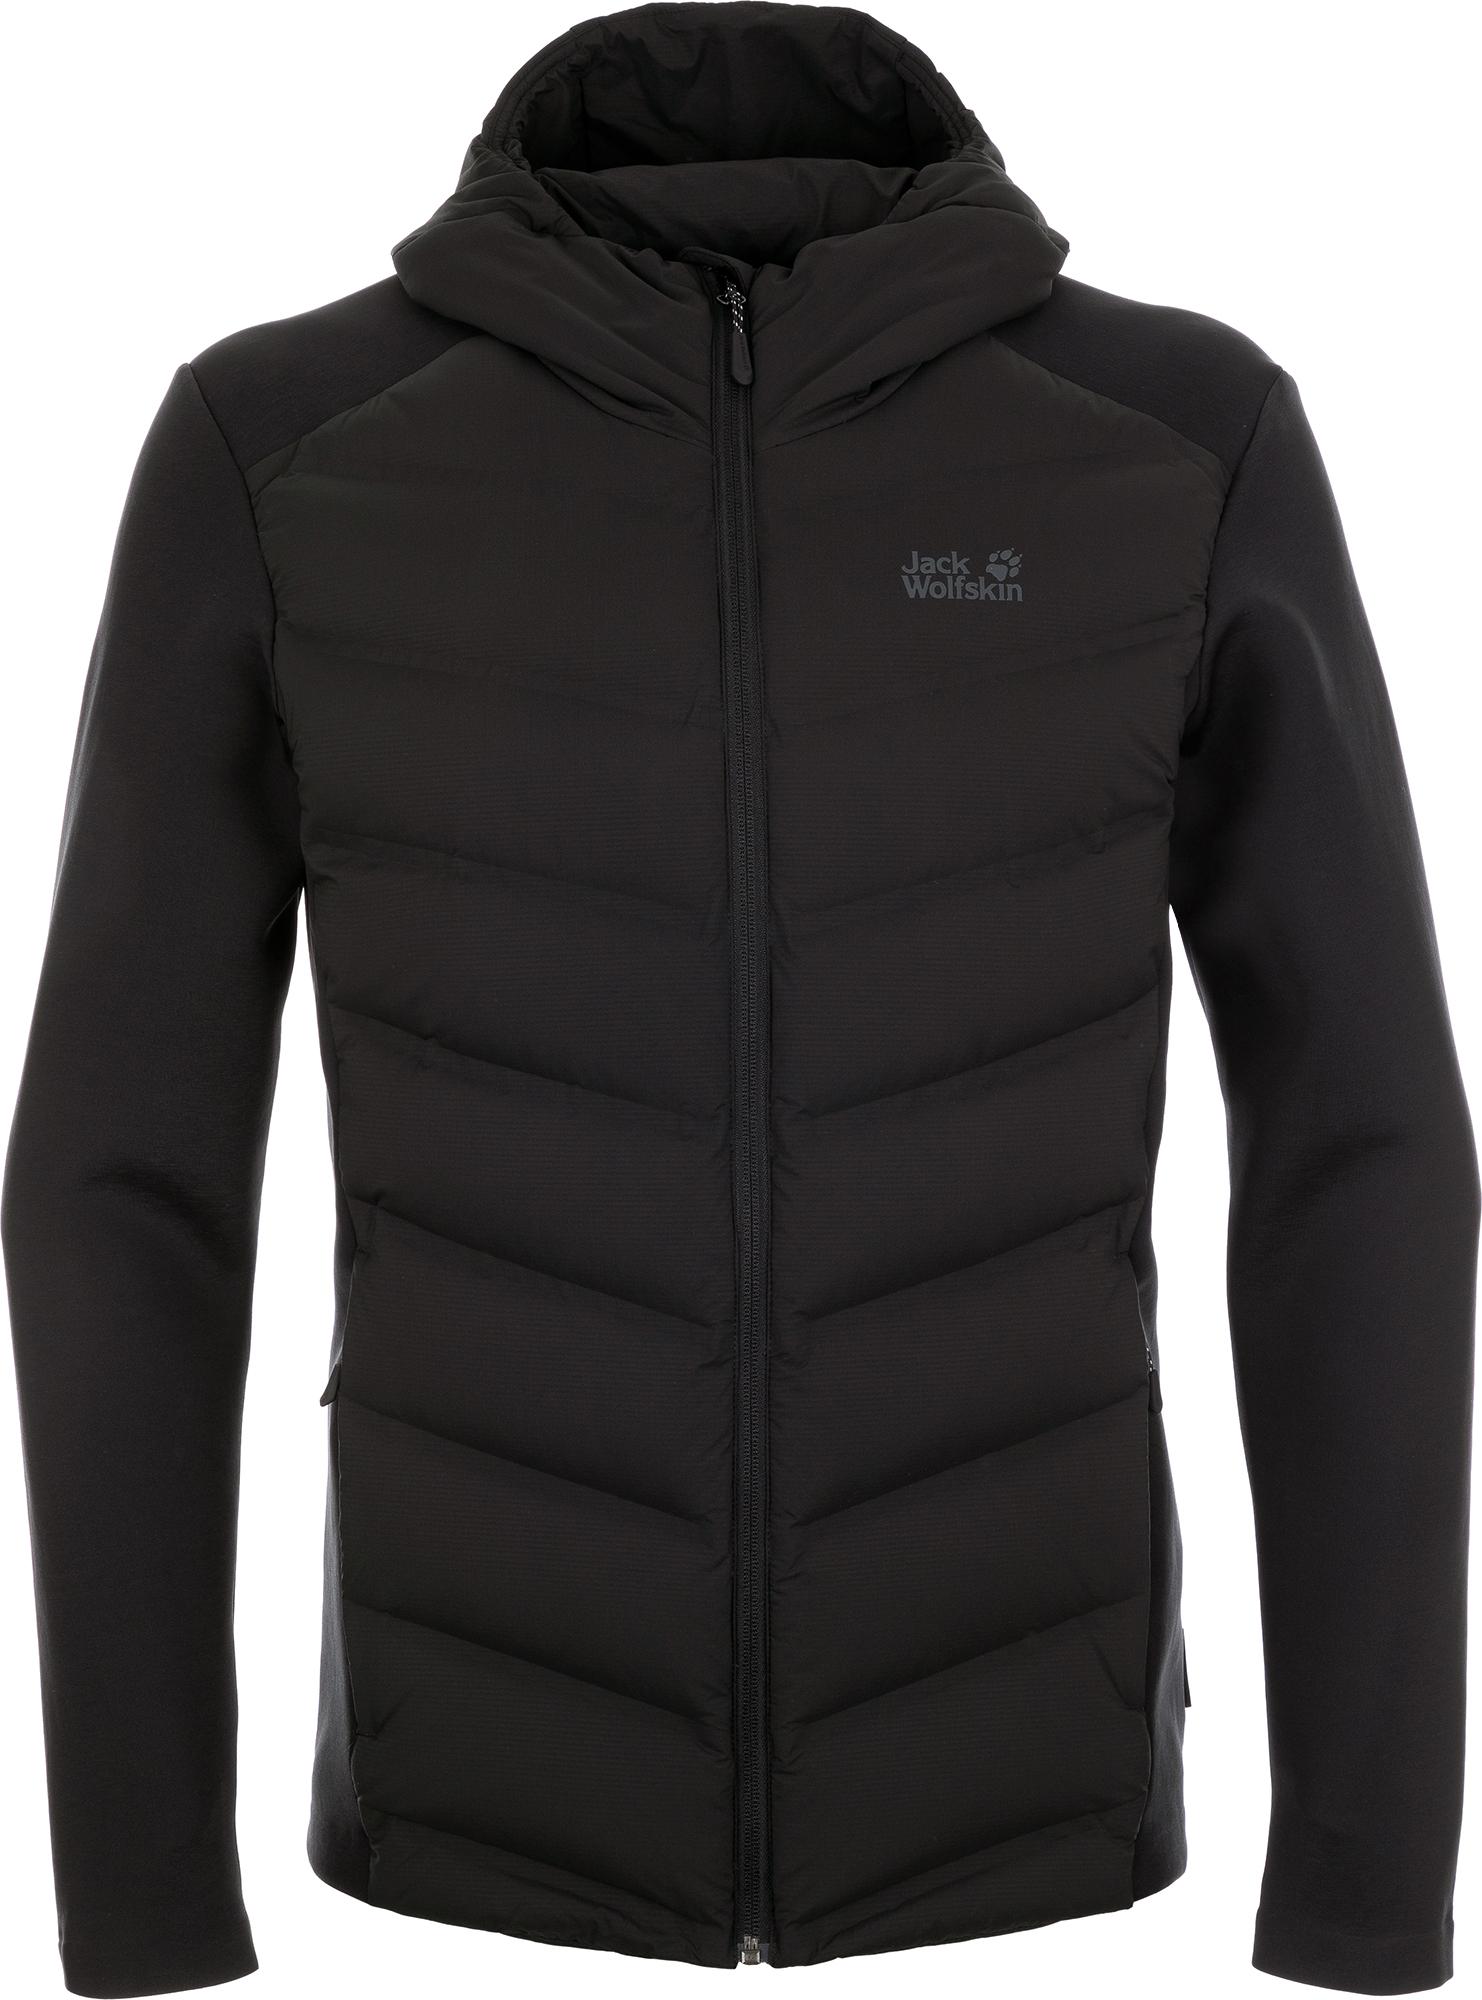 купить JACK WOLFSKIN Куртка пуховая мужская JACK WOLFSKIN Tasman, размер 54-56 по цене 9599 рублей